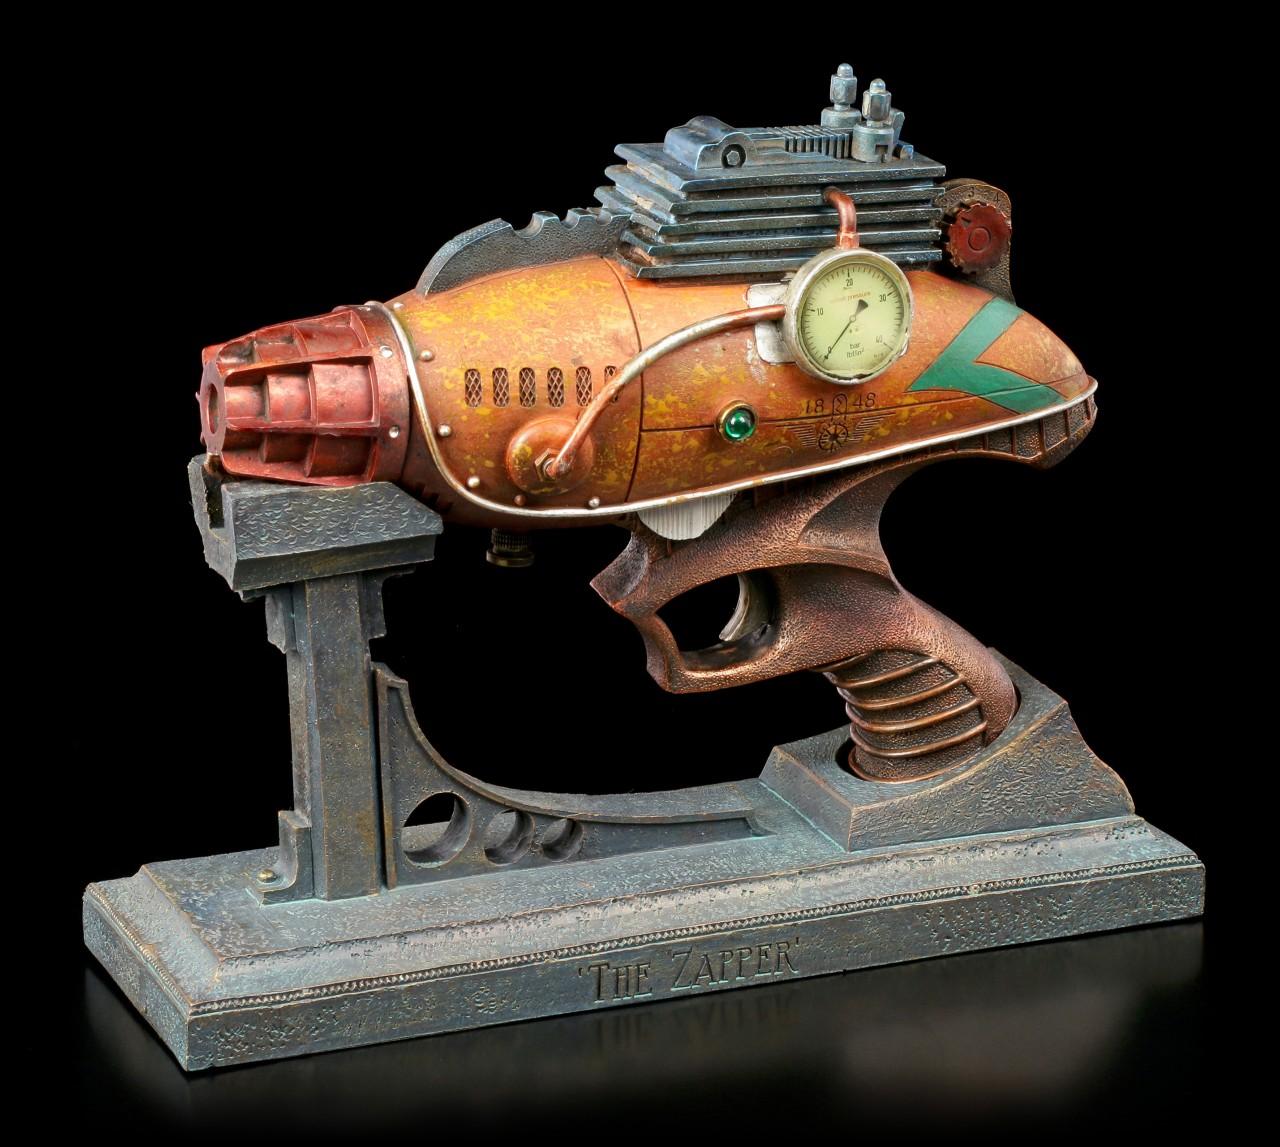 Steampunk Deko Pistole - The Zapper